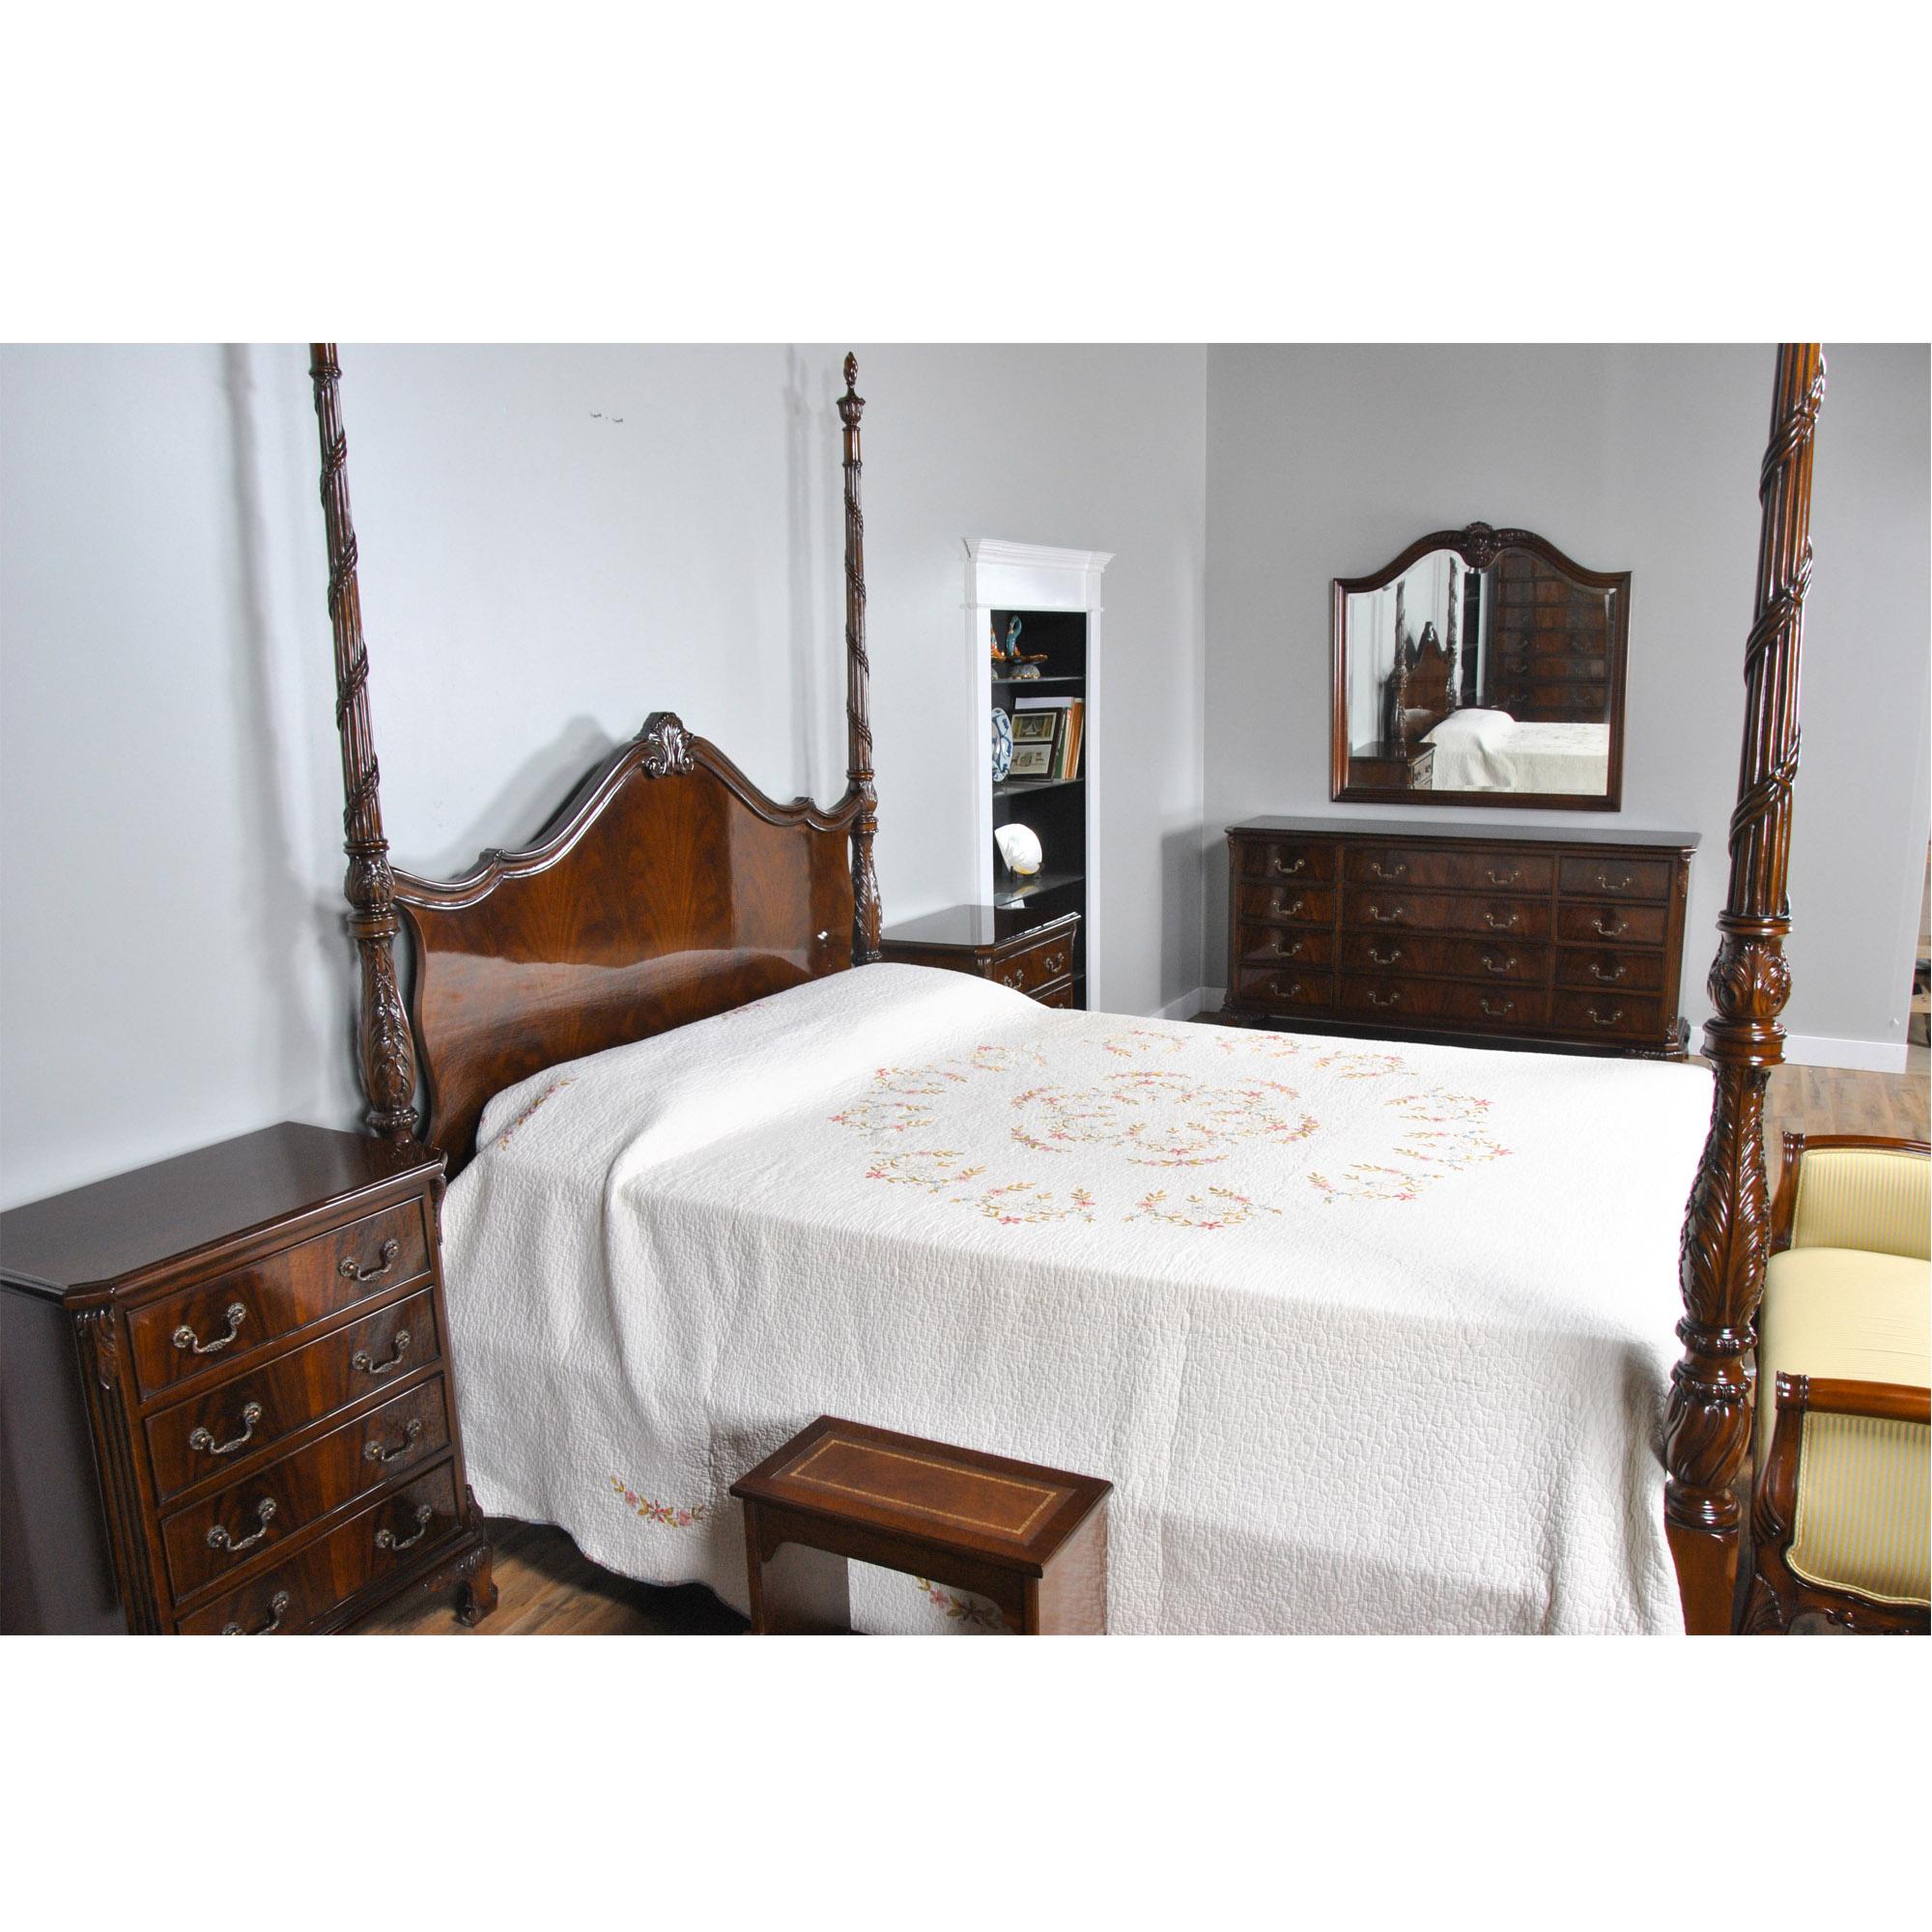 King Poster Bed Sets